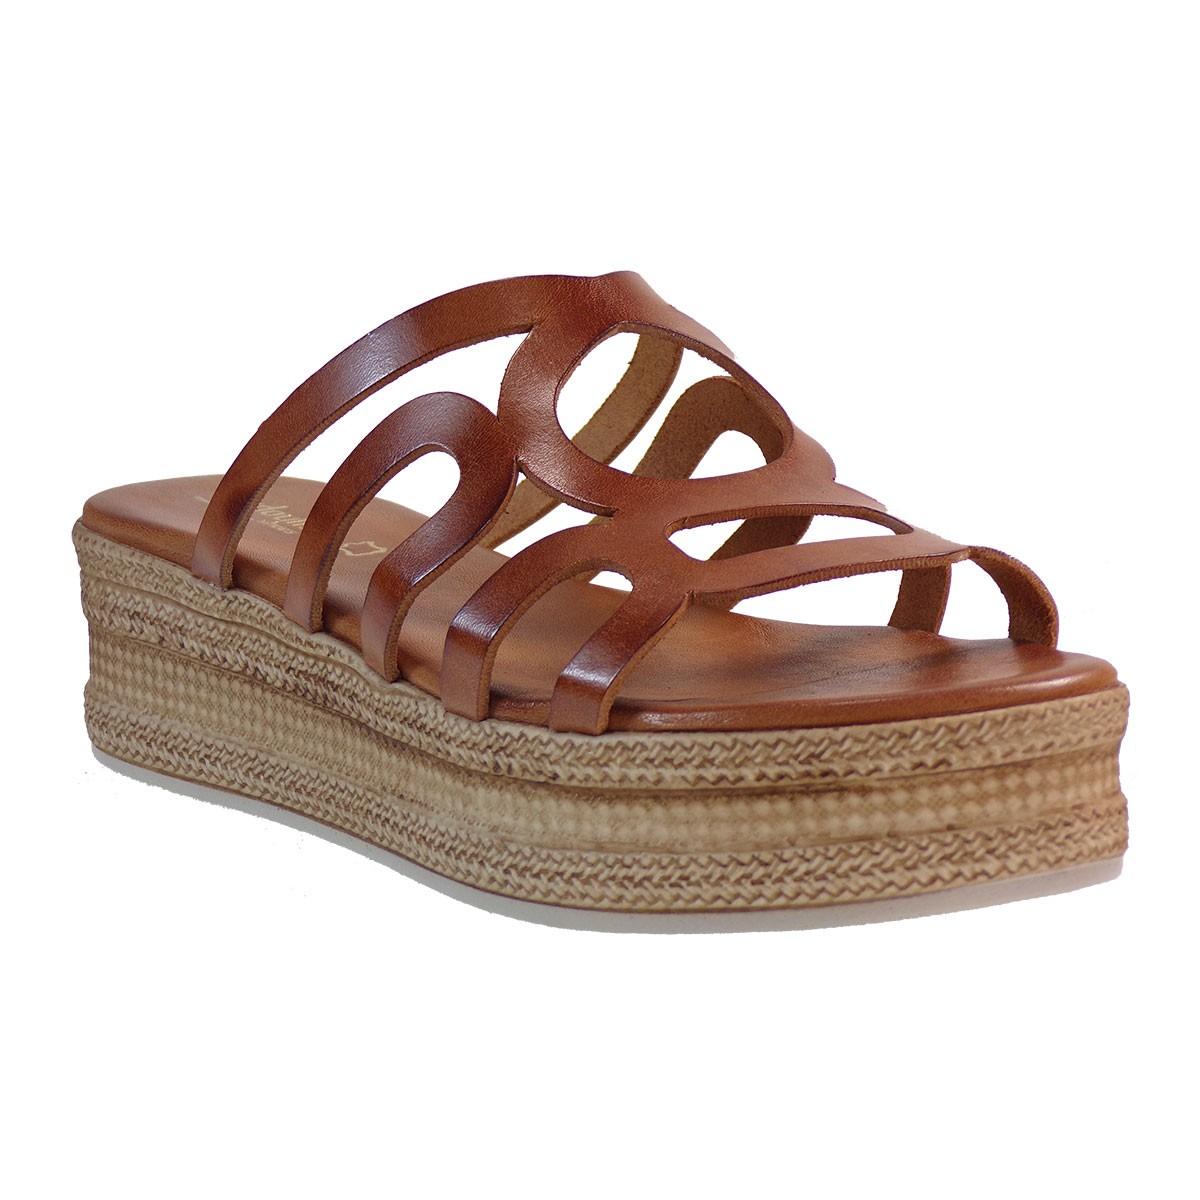 Fardoulis shoes Γυναικείες Πλατφόρμες Παντόφλες 63439 Ταμπά Δέρμα